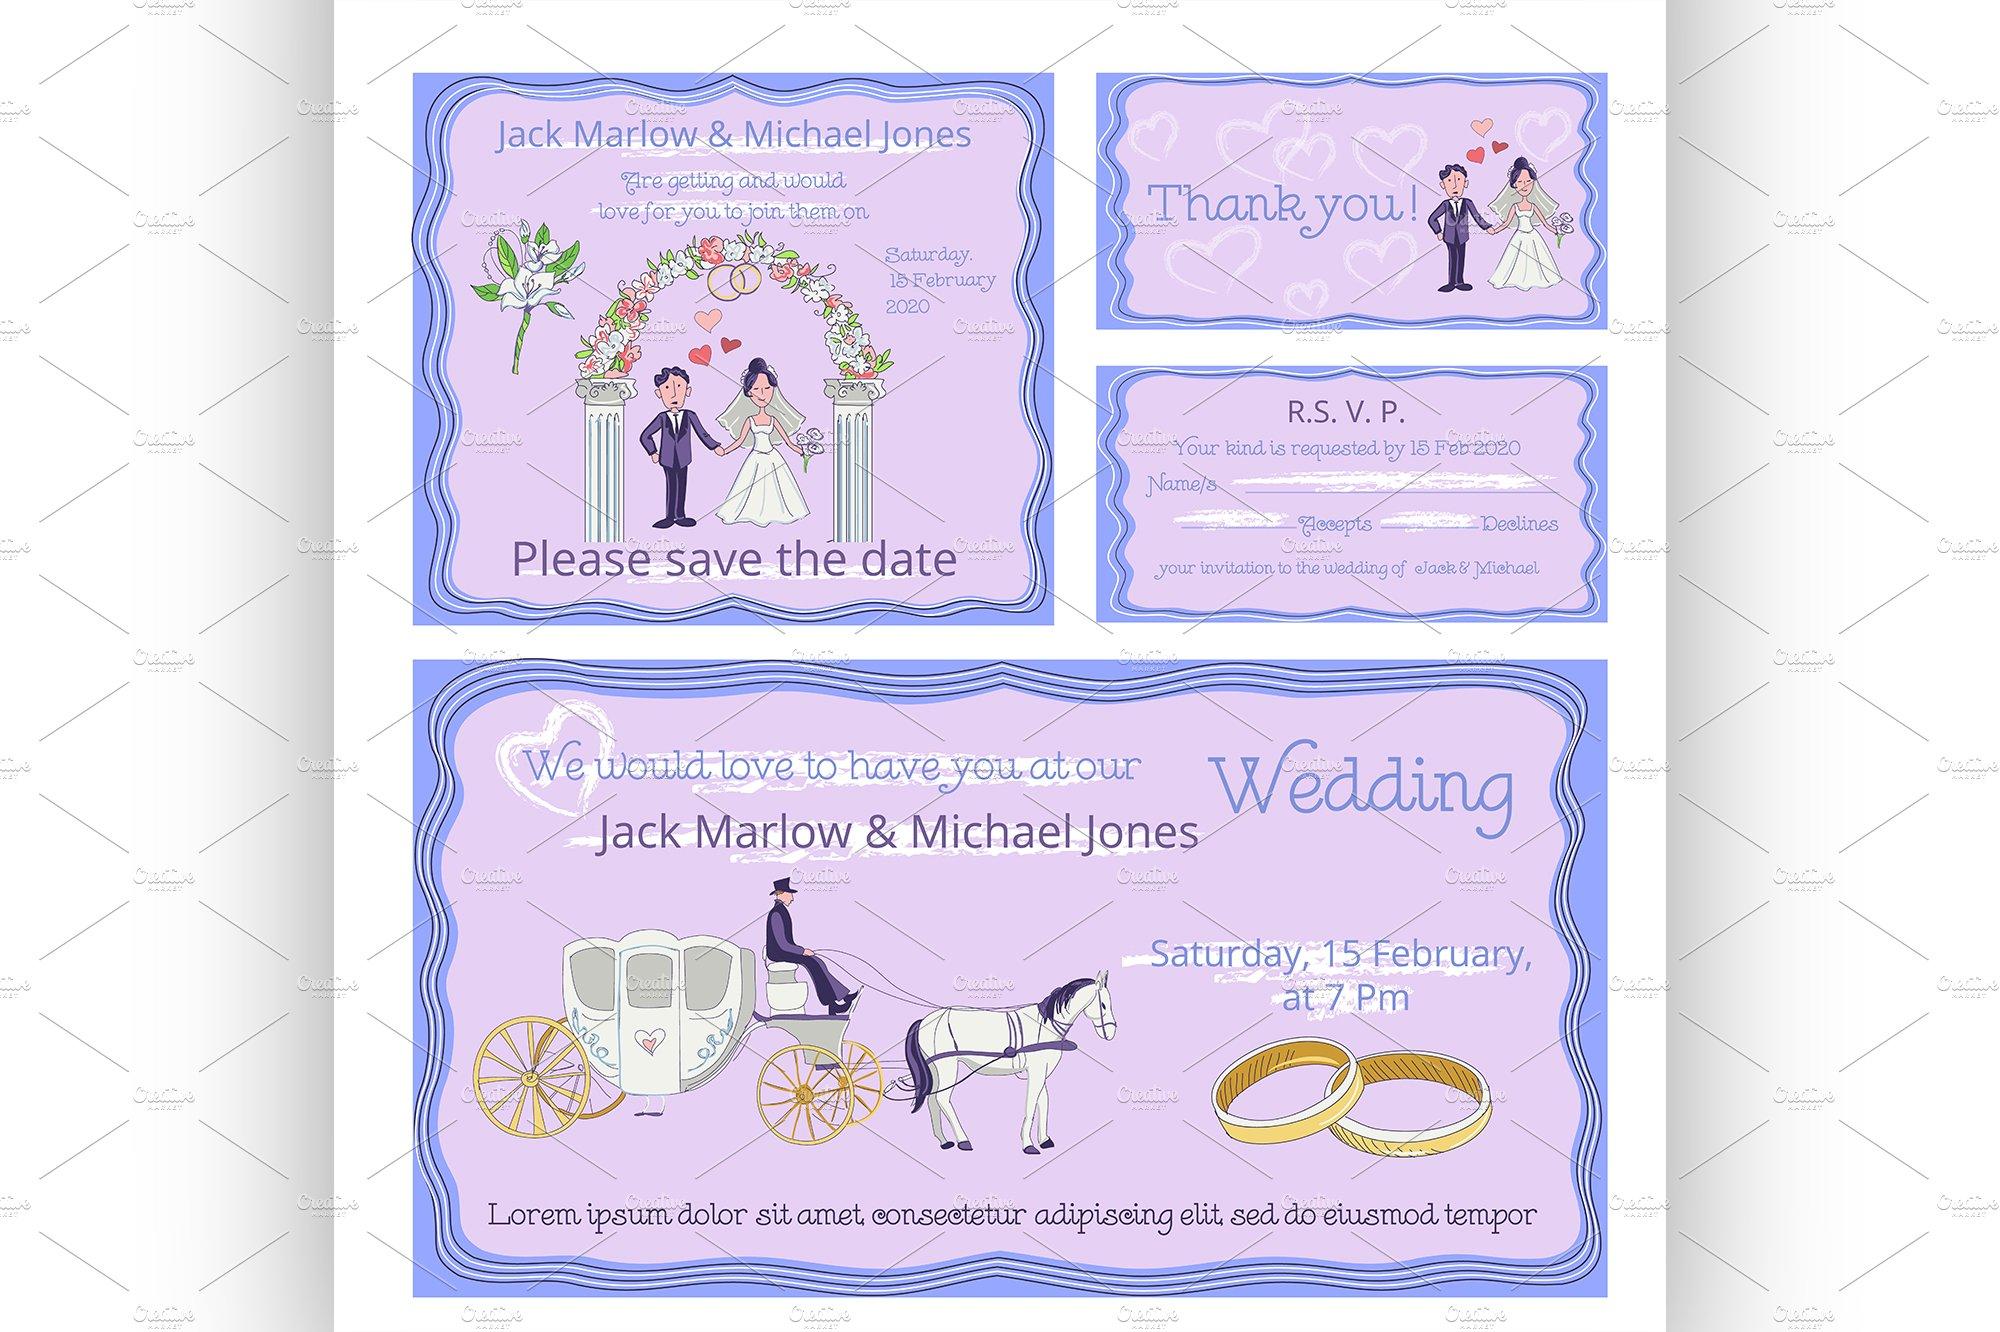 wedding invitation thank you card flyer templates creative market. Black Bedroom Furniture Sets. Home Design Ideas